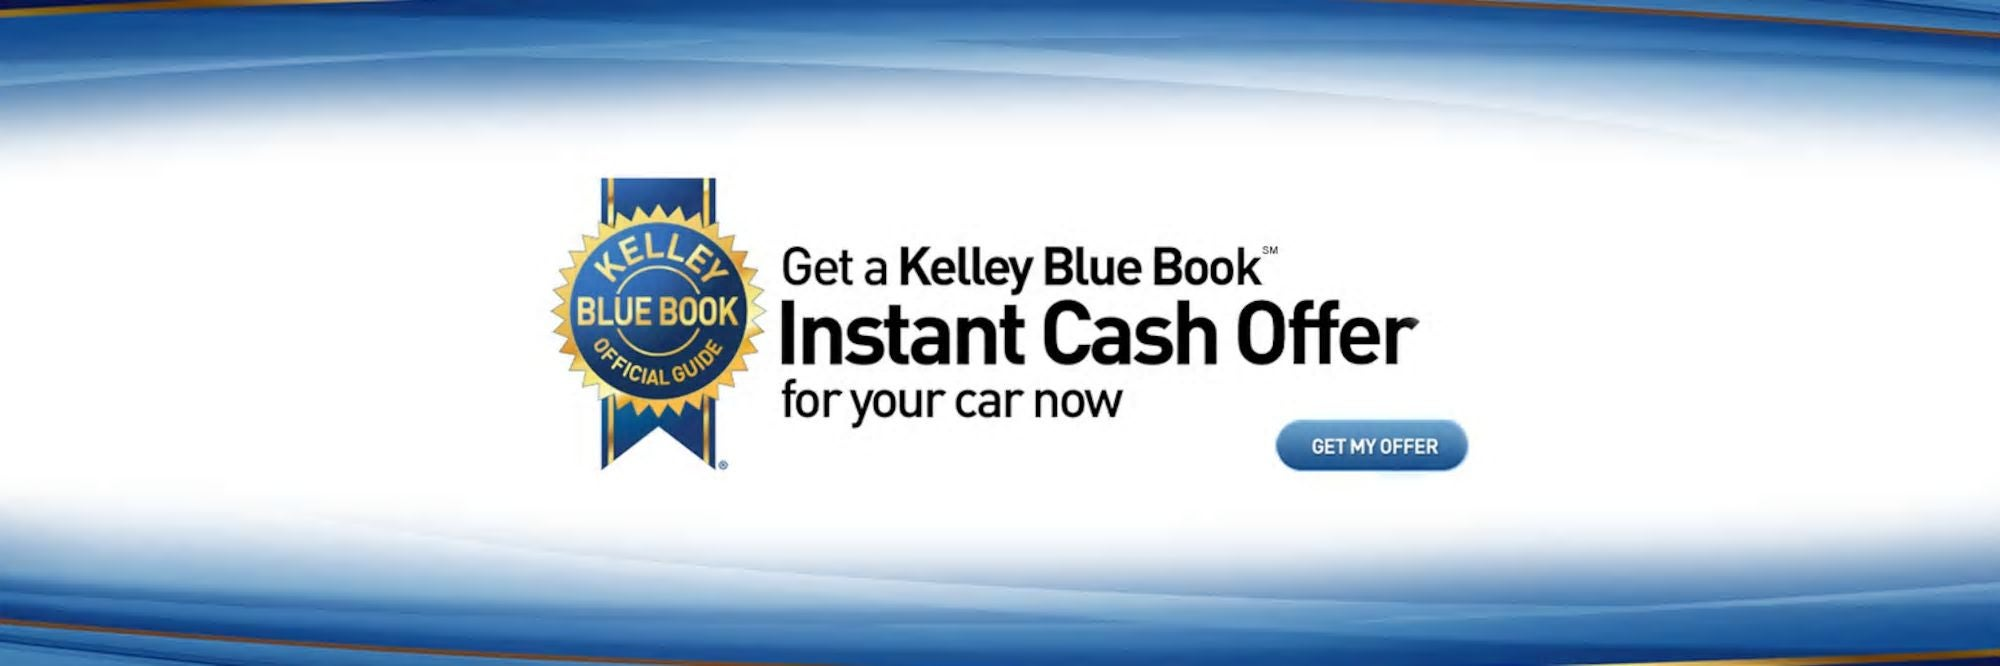 2012 ford ranger kelley blue book